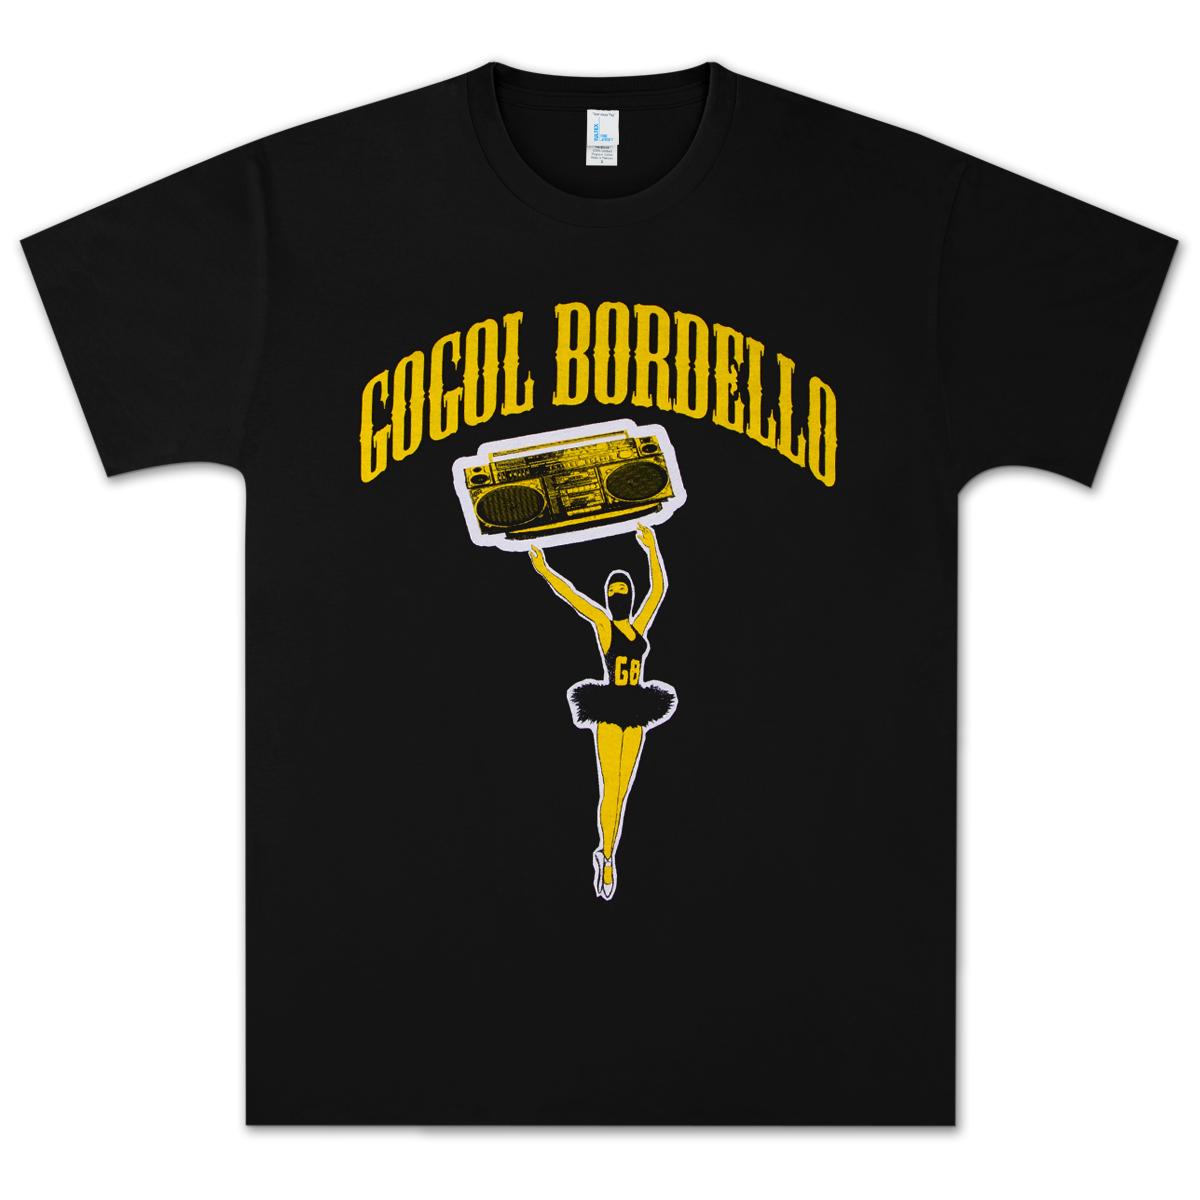 Gogol Bordello Ballerina T-Shirt